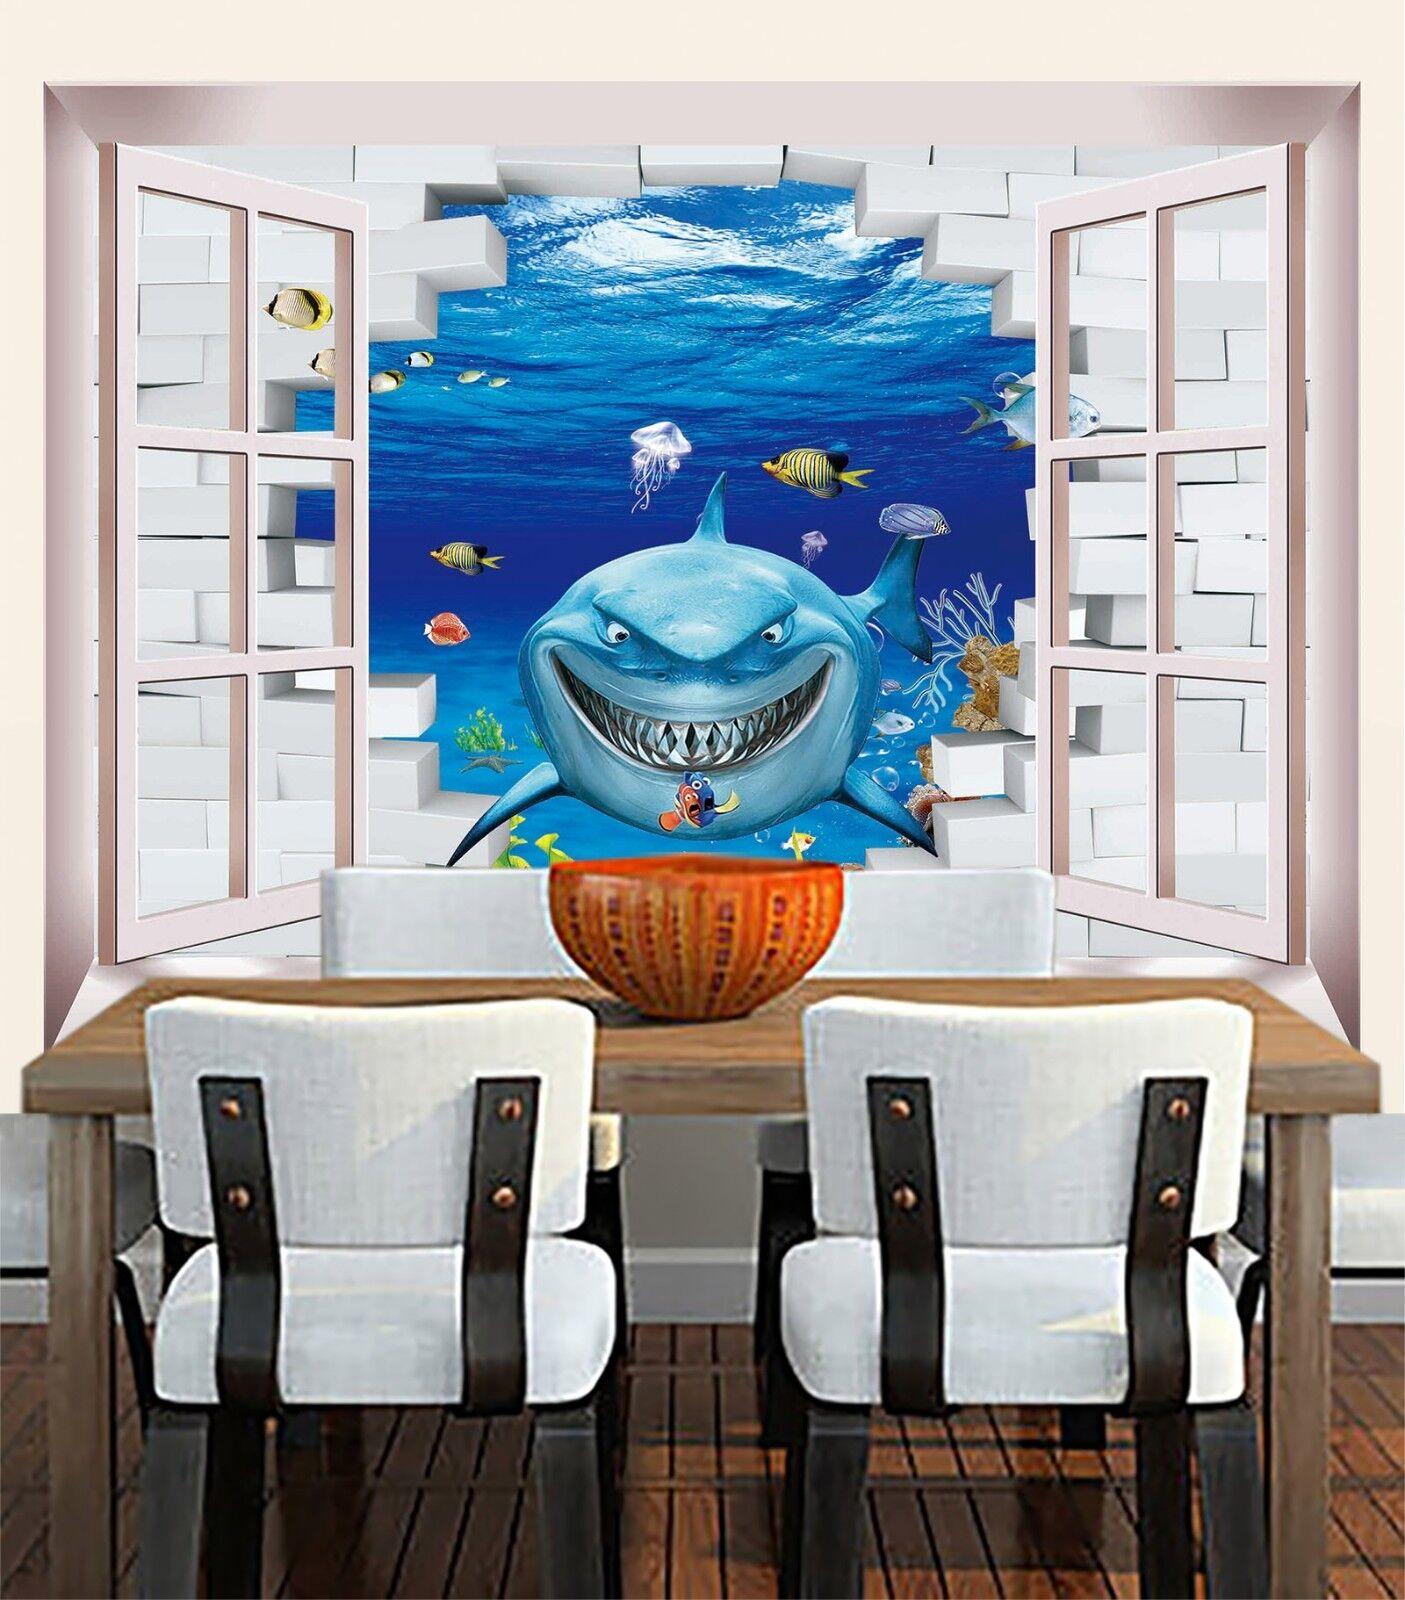 3D Ozean Hai Fenster 798 Tapete Wandgemälde Tapeten Bild Familie DE Jenny   Billig ideal    Fairer Preis    Ausreichende Versorgung